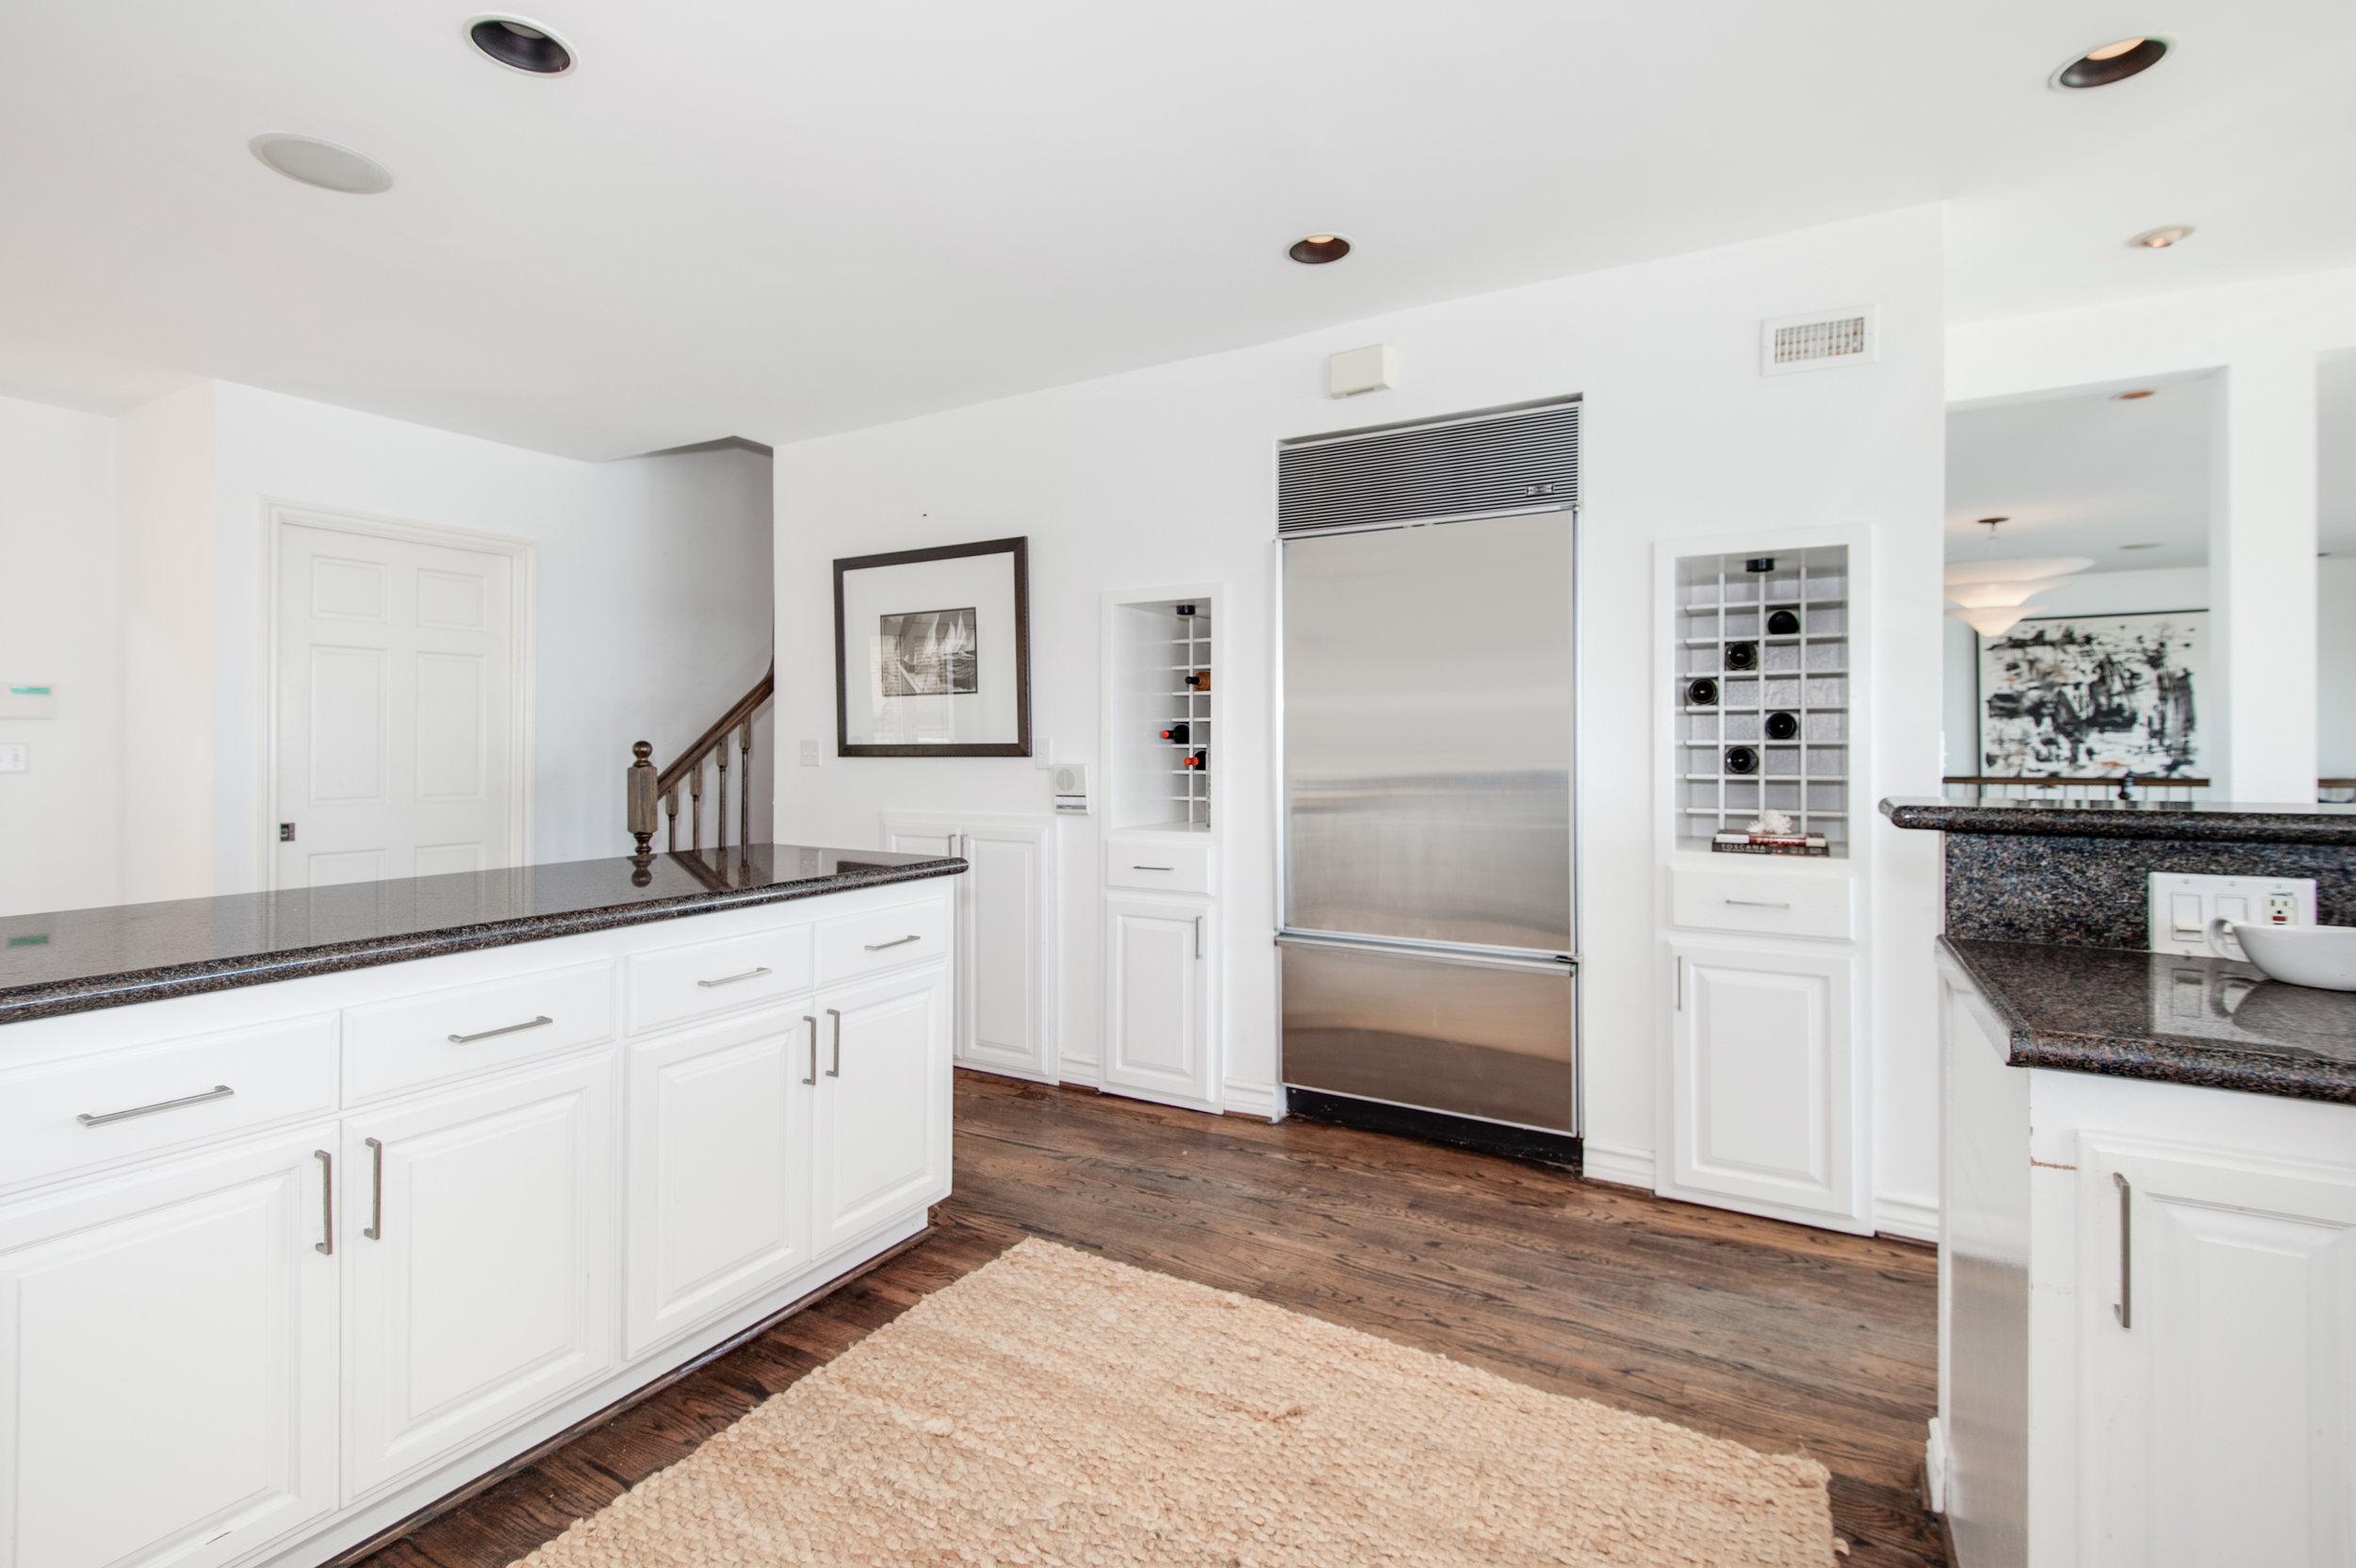 011 Kitchen 25342 Malibu Road For Sale Lease The Malibu Life Team Luxury Real Estate.jpg